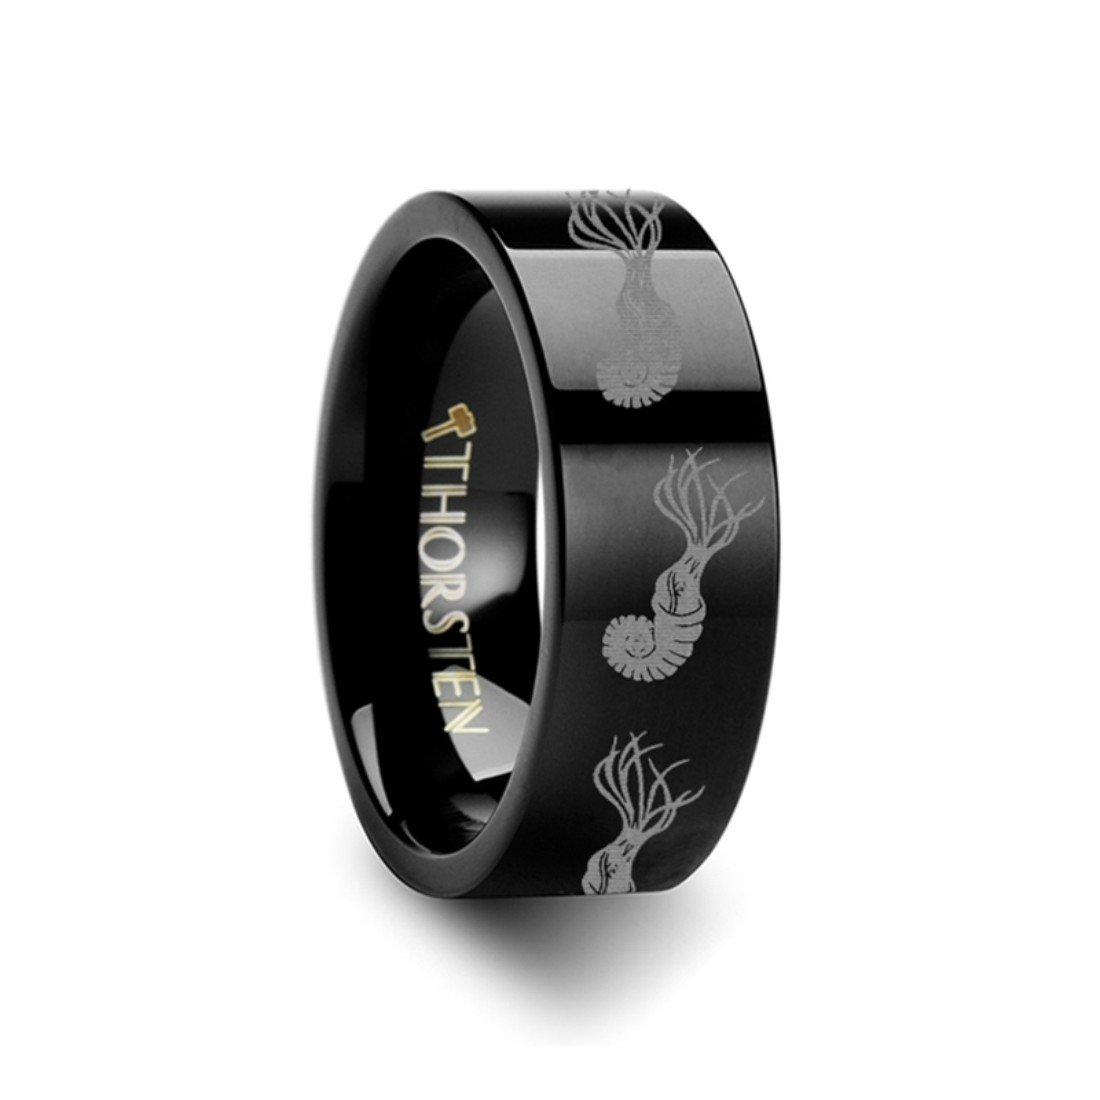 Thorsten Dinosaur Ring Ammonite Prehistoric Paleo Flat Black Tungsten Ring 6mm Wide Wedding Band from Roy Rose Jewelry